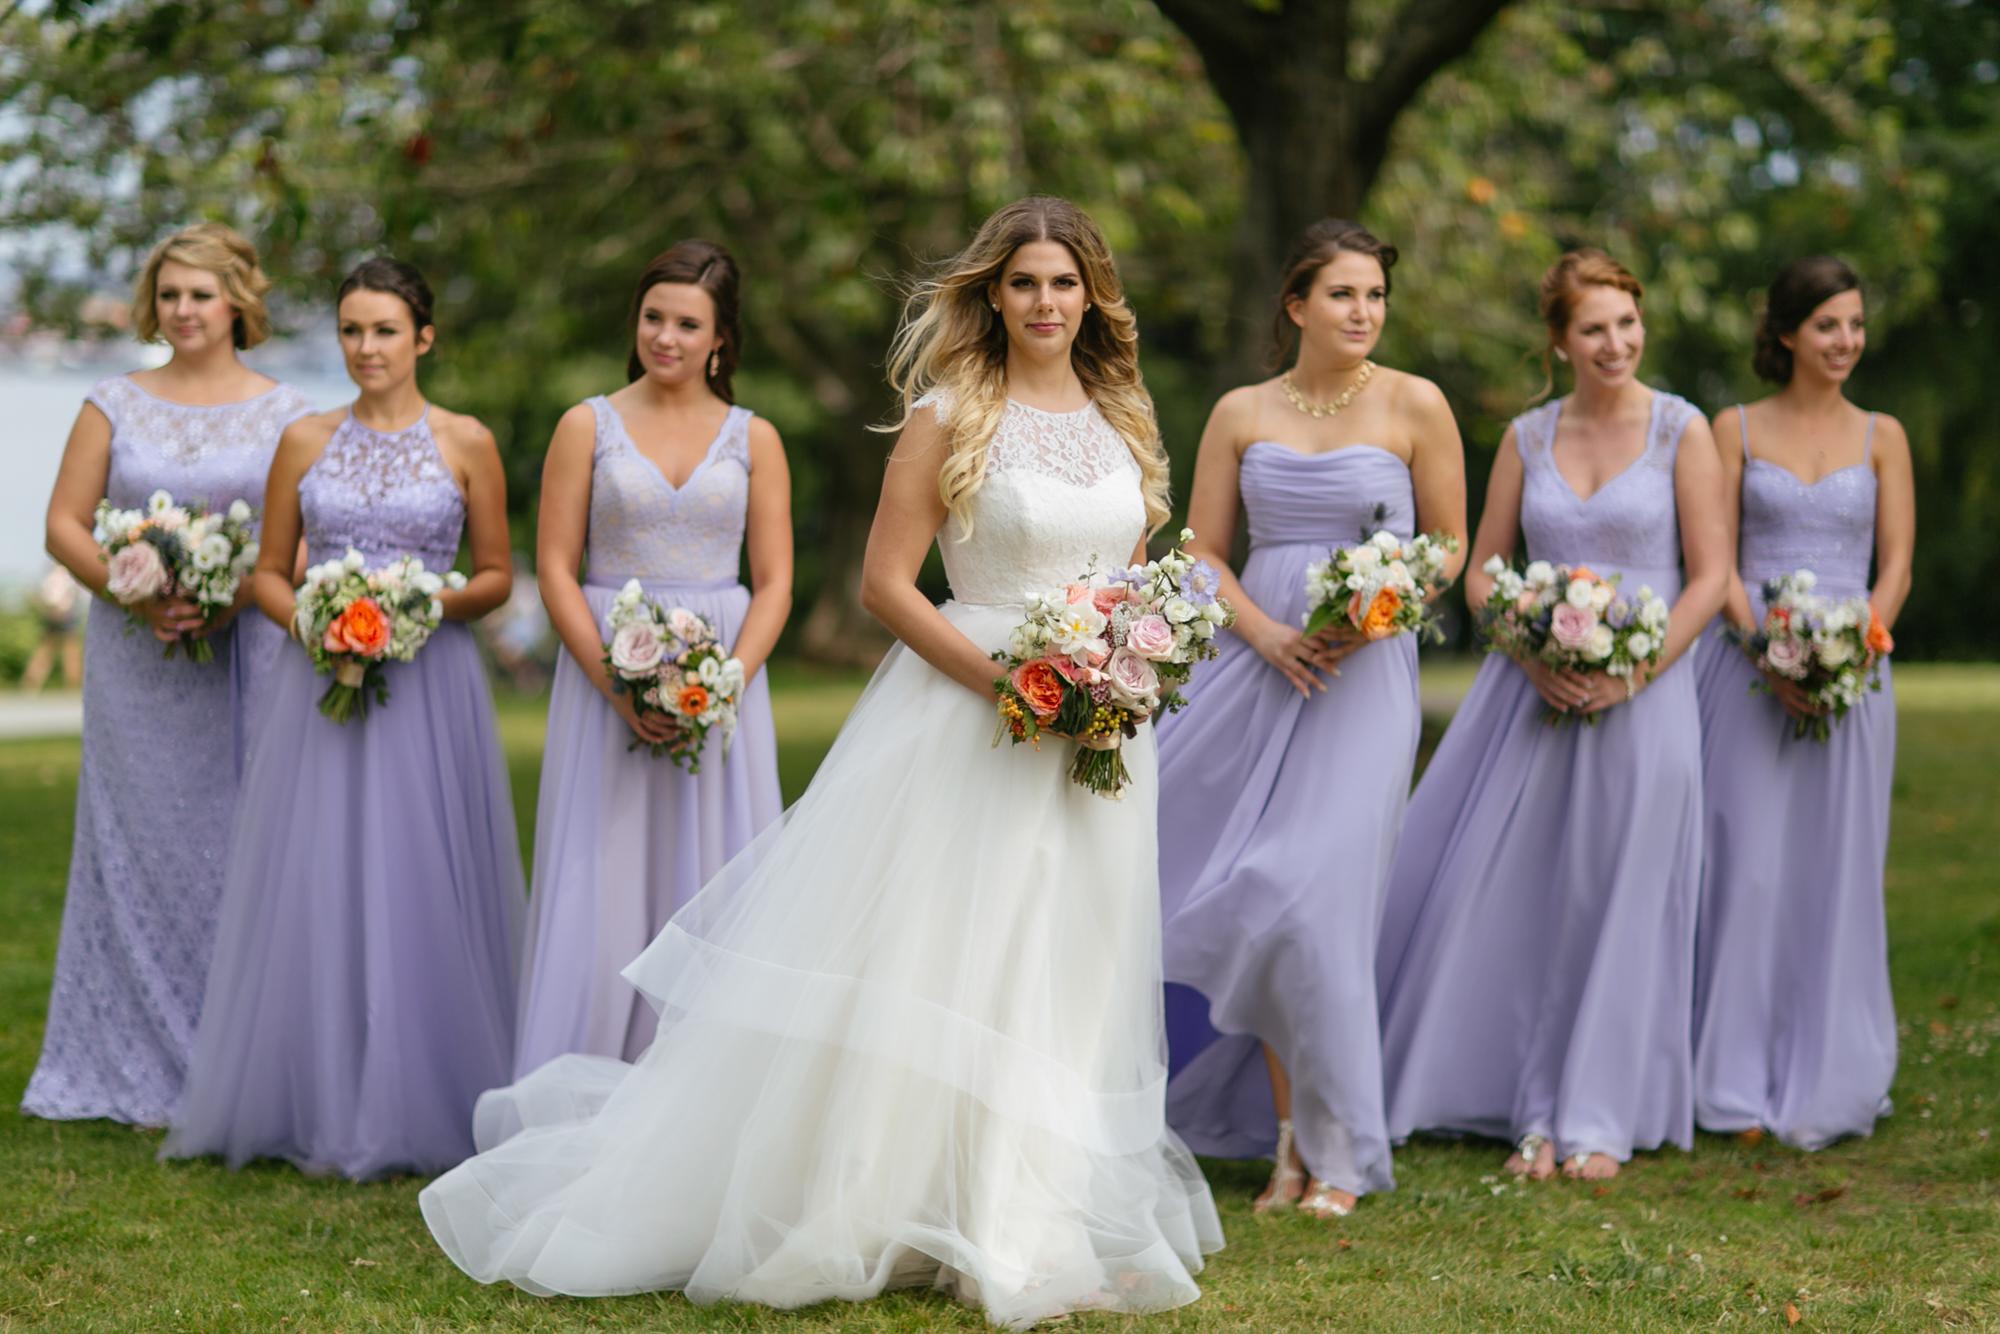 vancouver-luxury-wedding-photographer-lori-miles-088.jpg